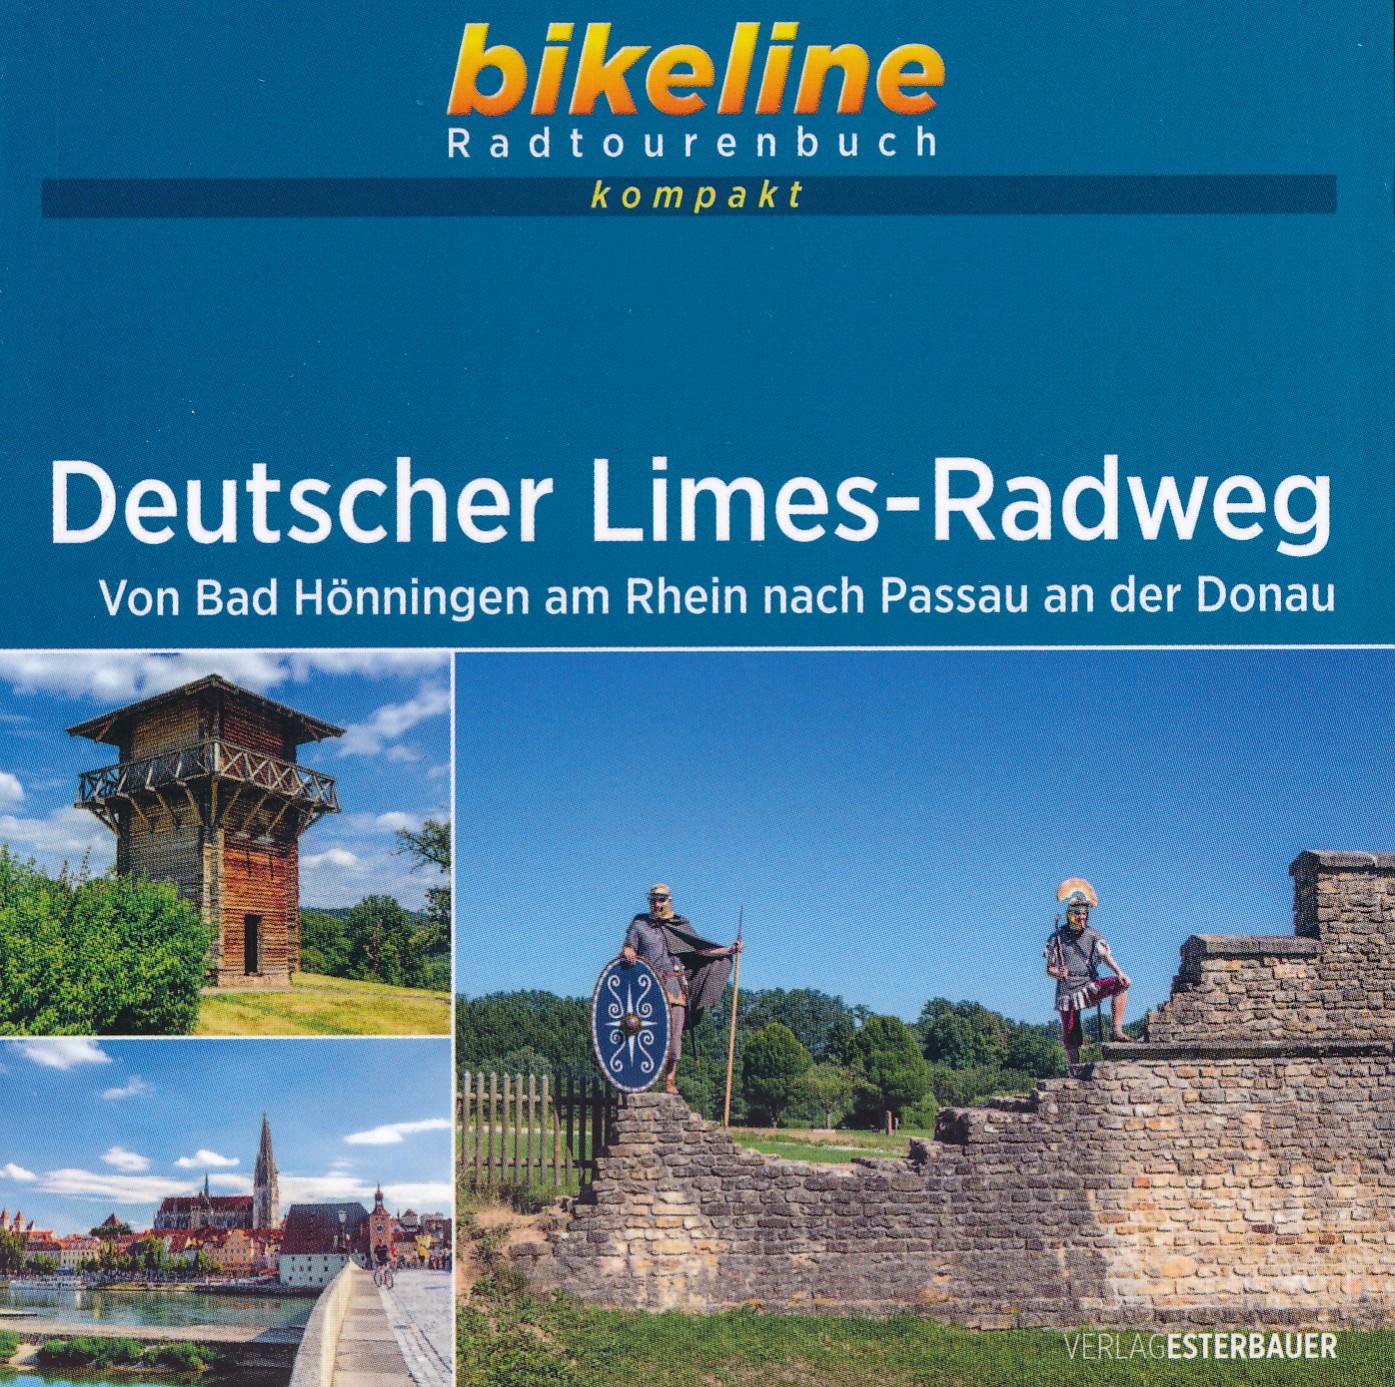 Fietsgids Bikeline Radtourenbuch kompakt Deutscher LimesRadweg | Esterbauer de zwerver